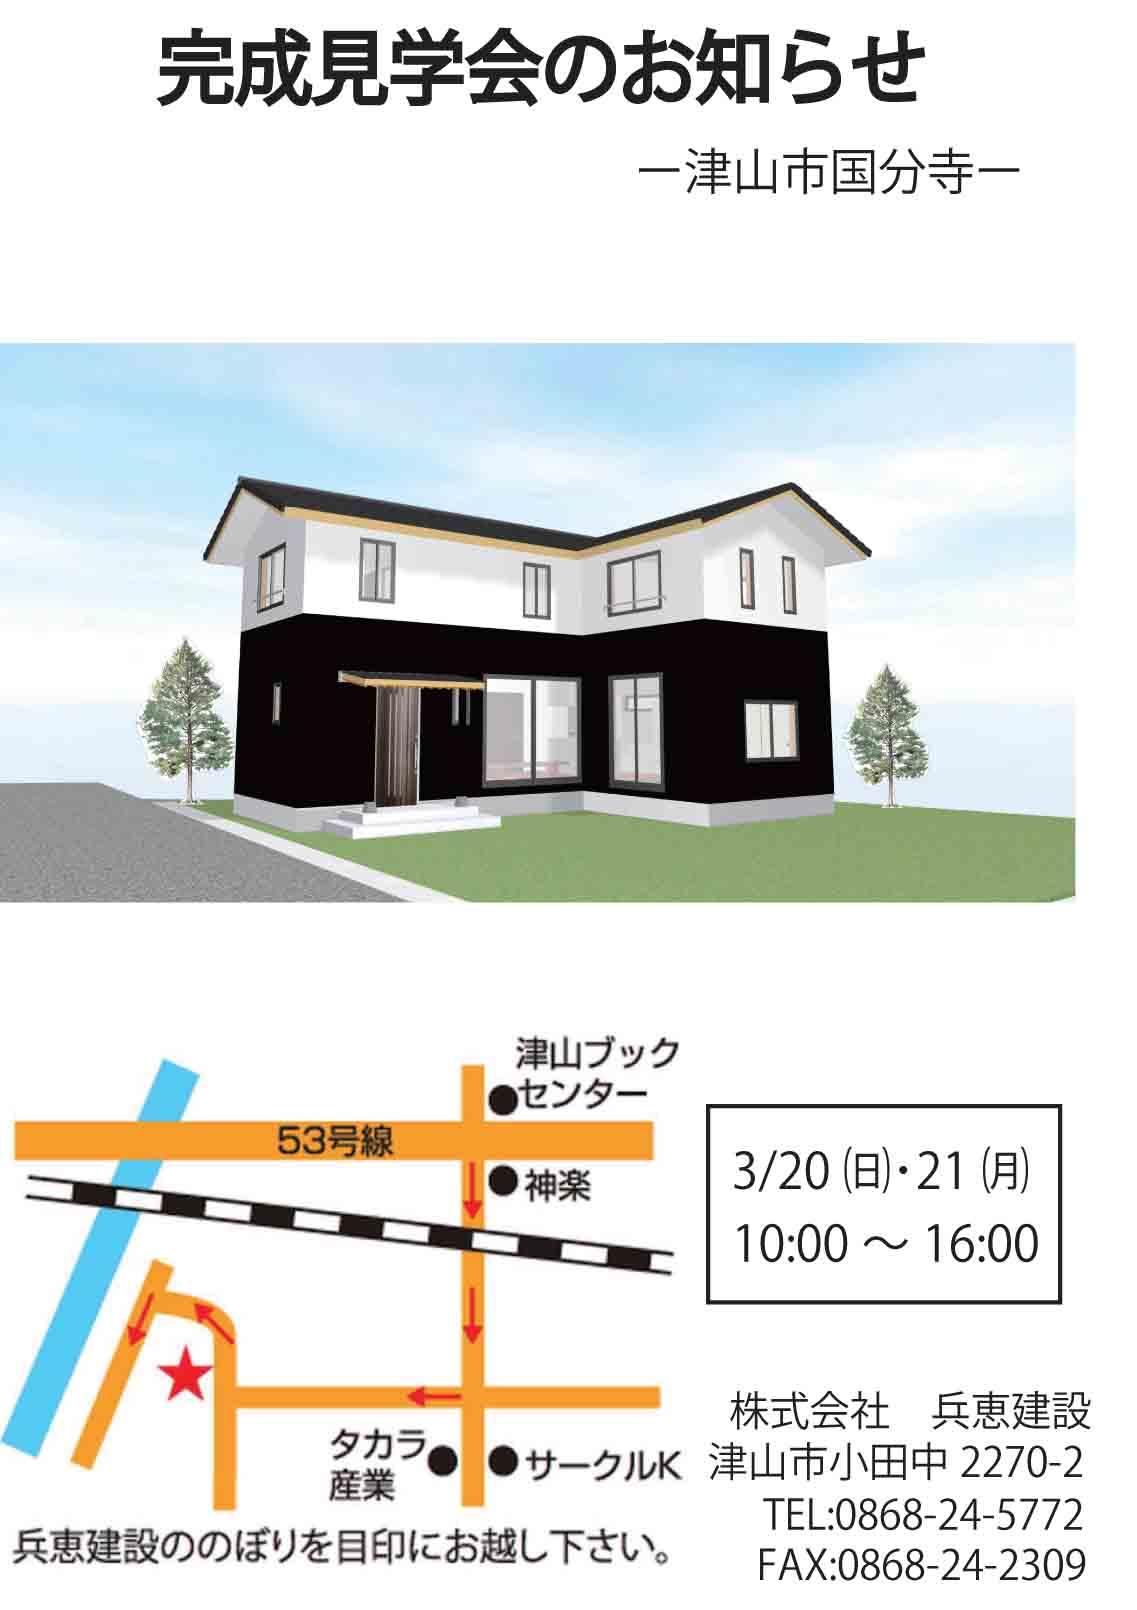 UHNNFU+KozGoPr6N-Regular-90msp-RKSJ-H Adobe Japan1 6